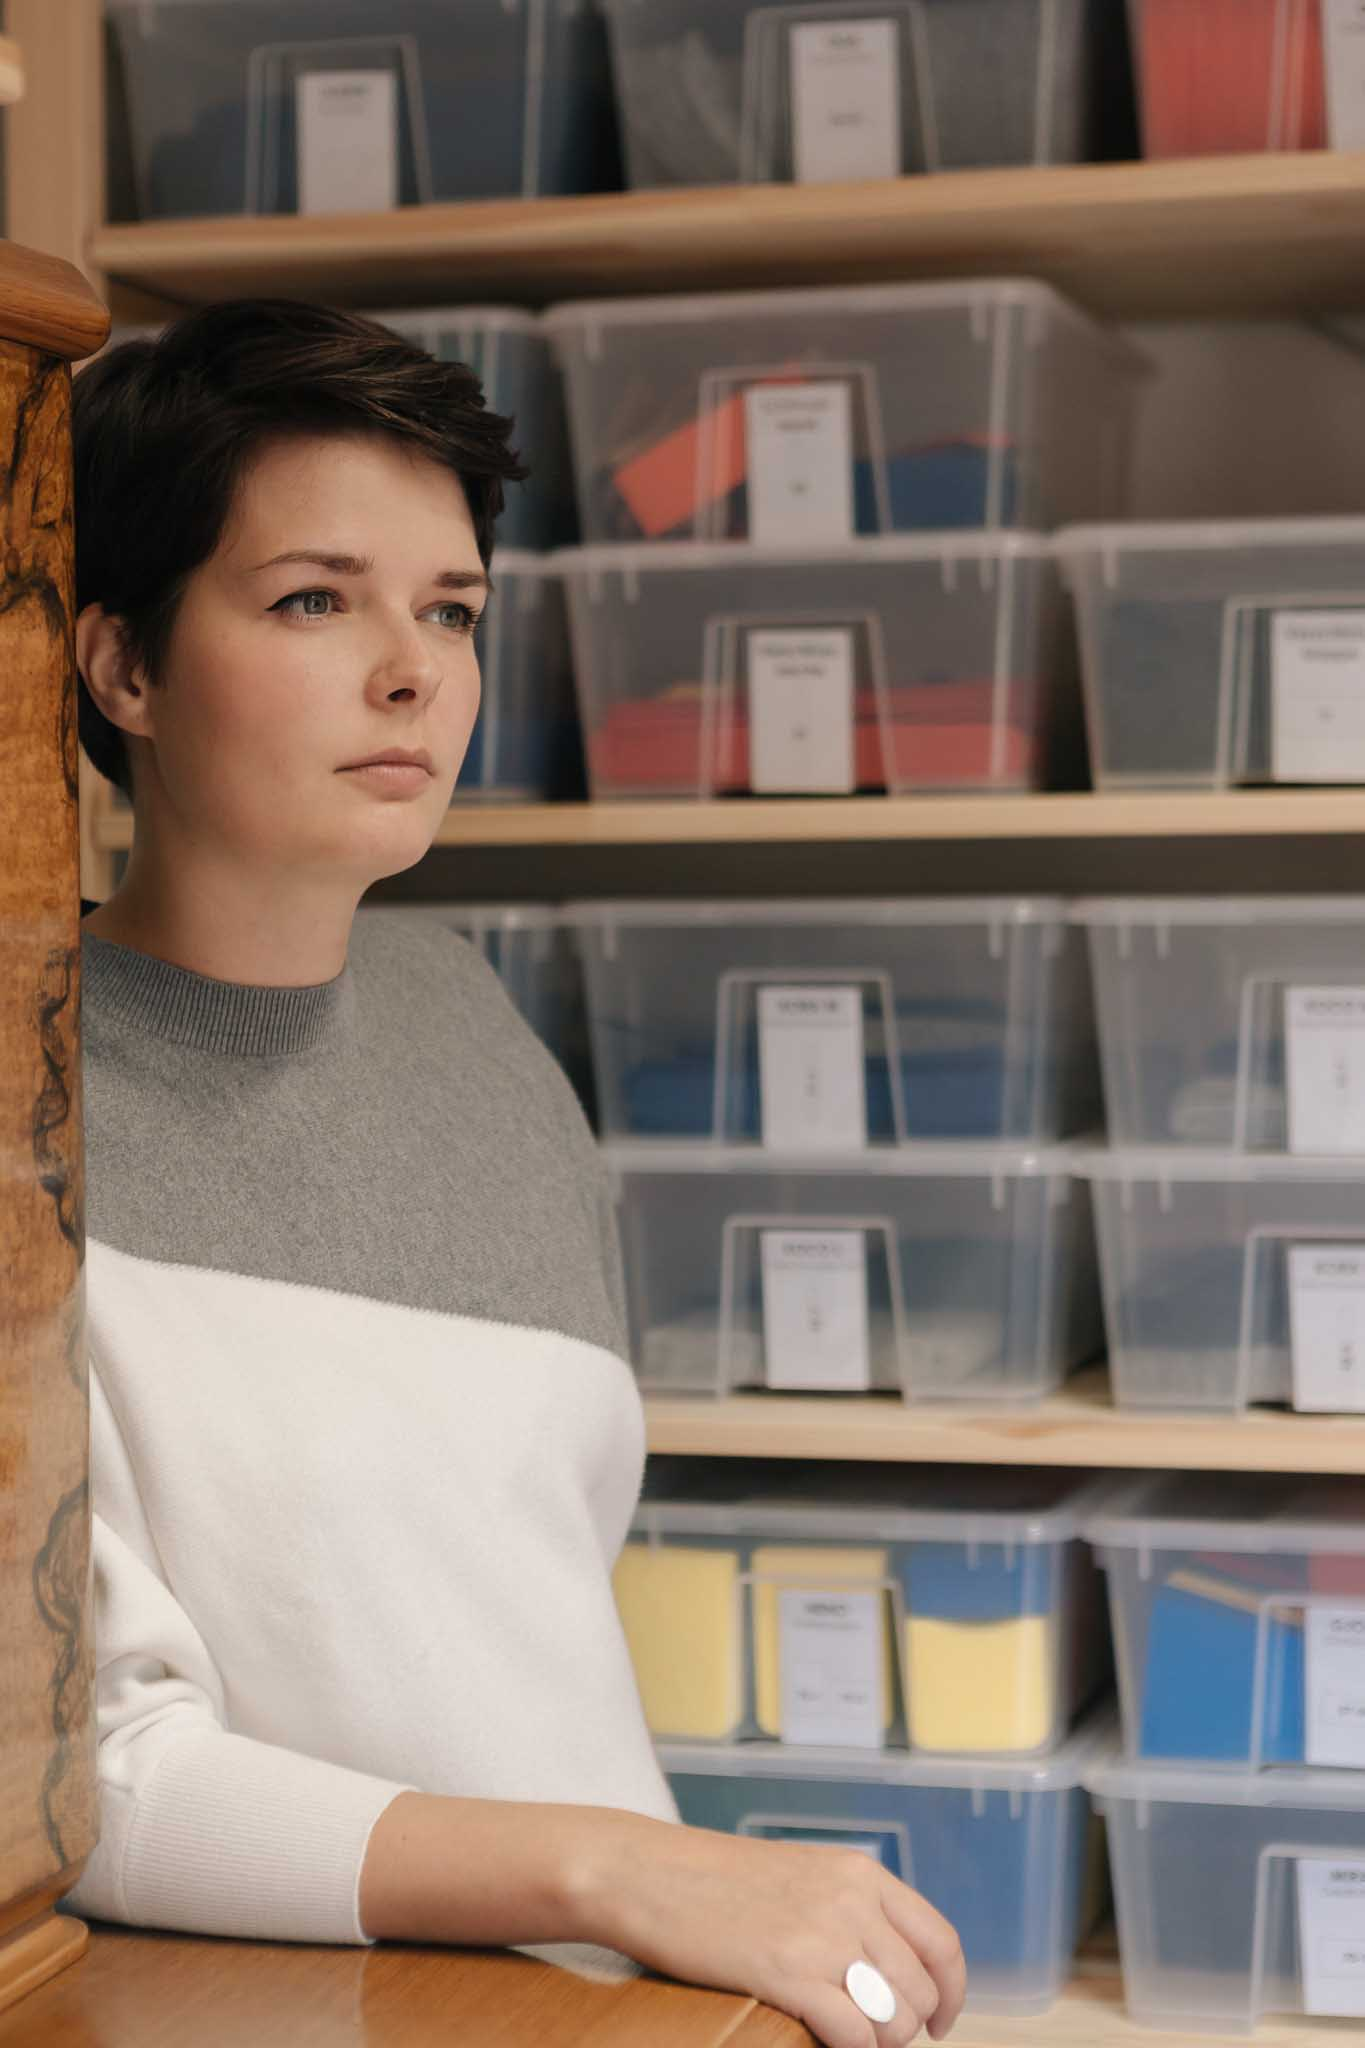 Labelgründerin von RÅVARE Jenny Ullmann hat alle Arbeitsabläufe strukturiert.